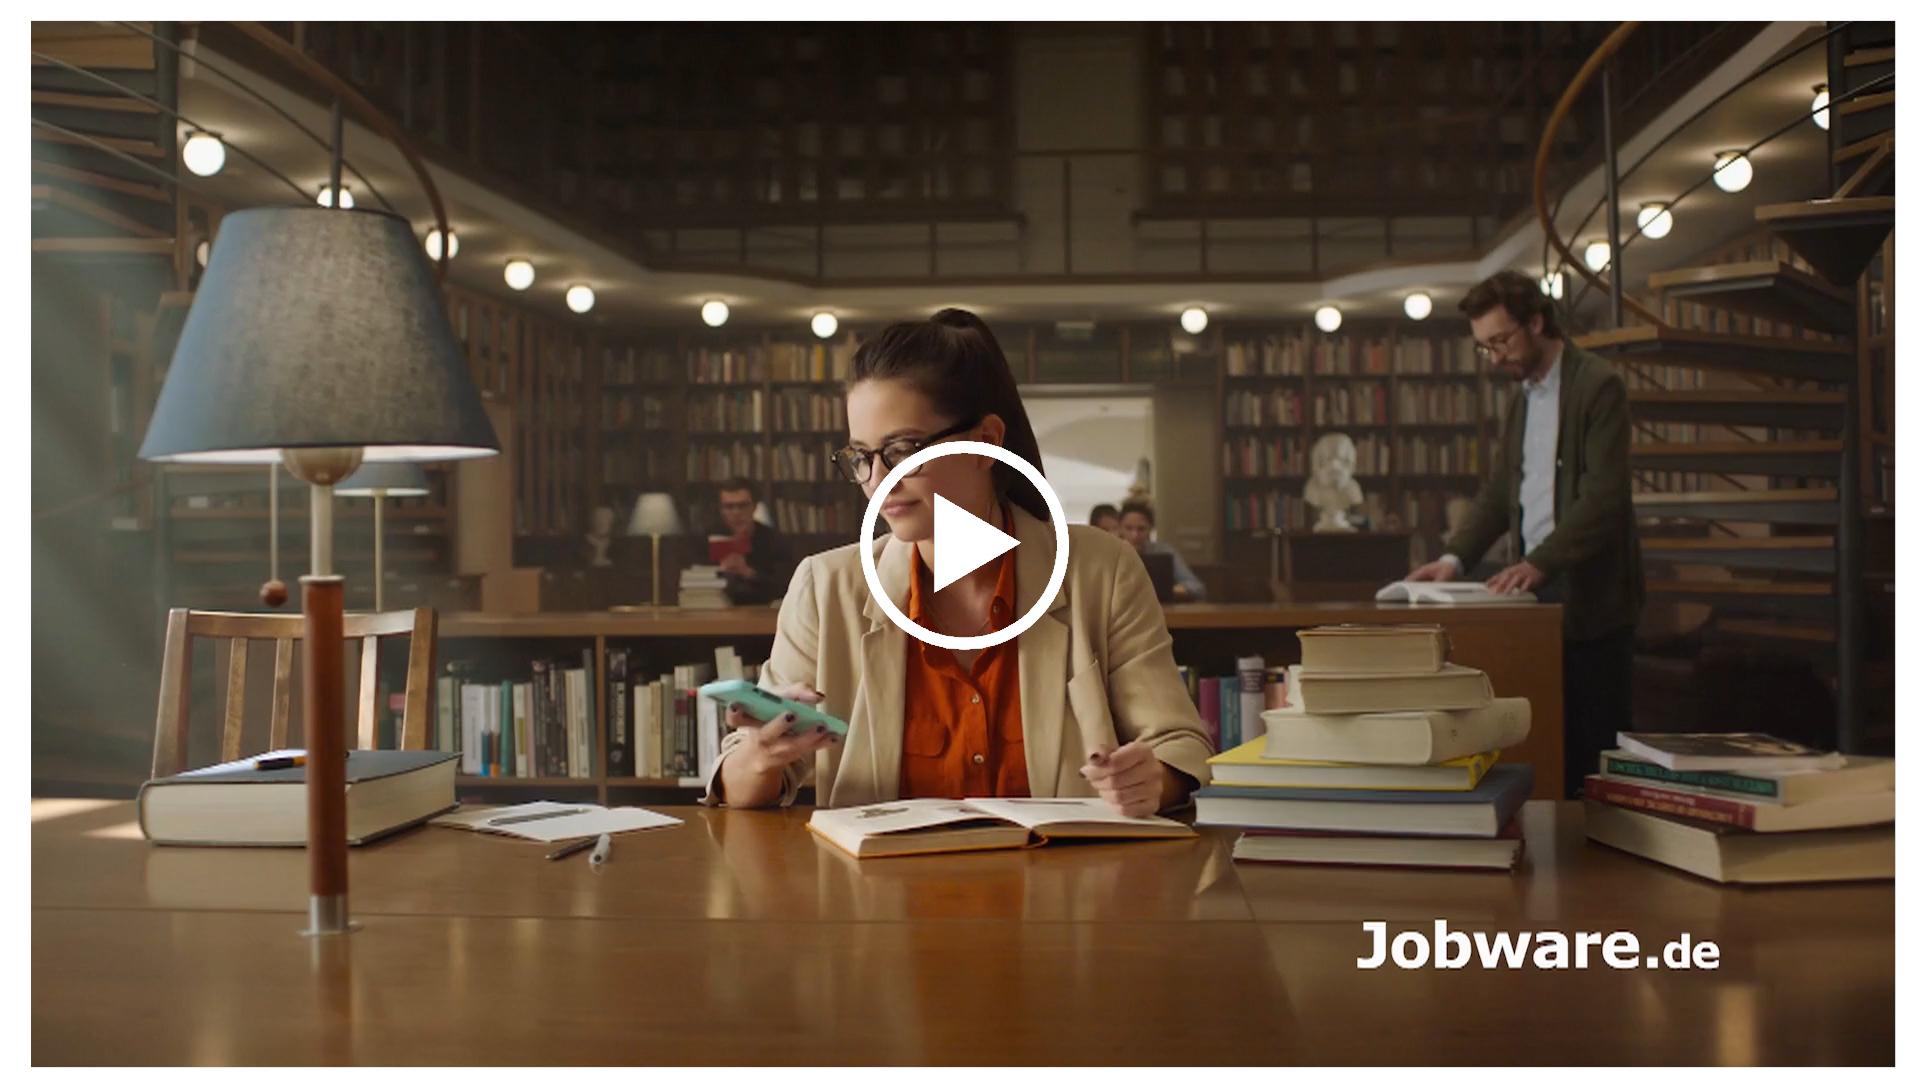 tvc-werbung-jobware-jubilate